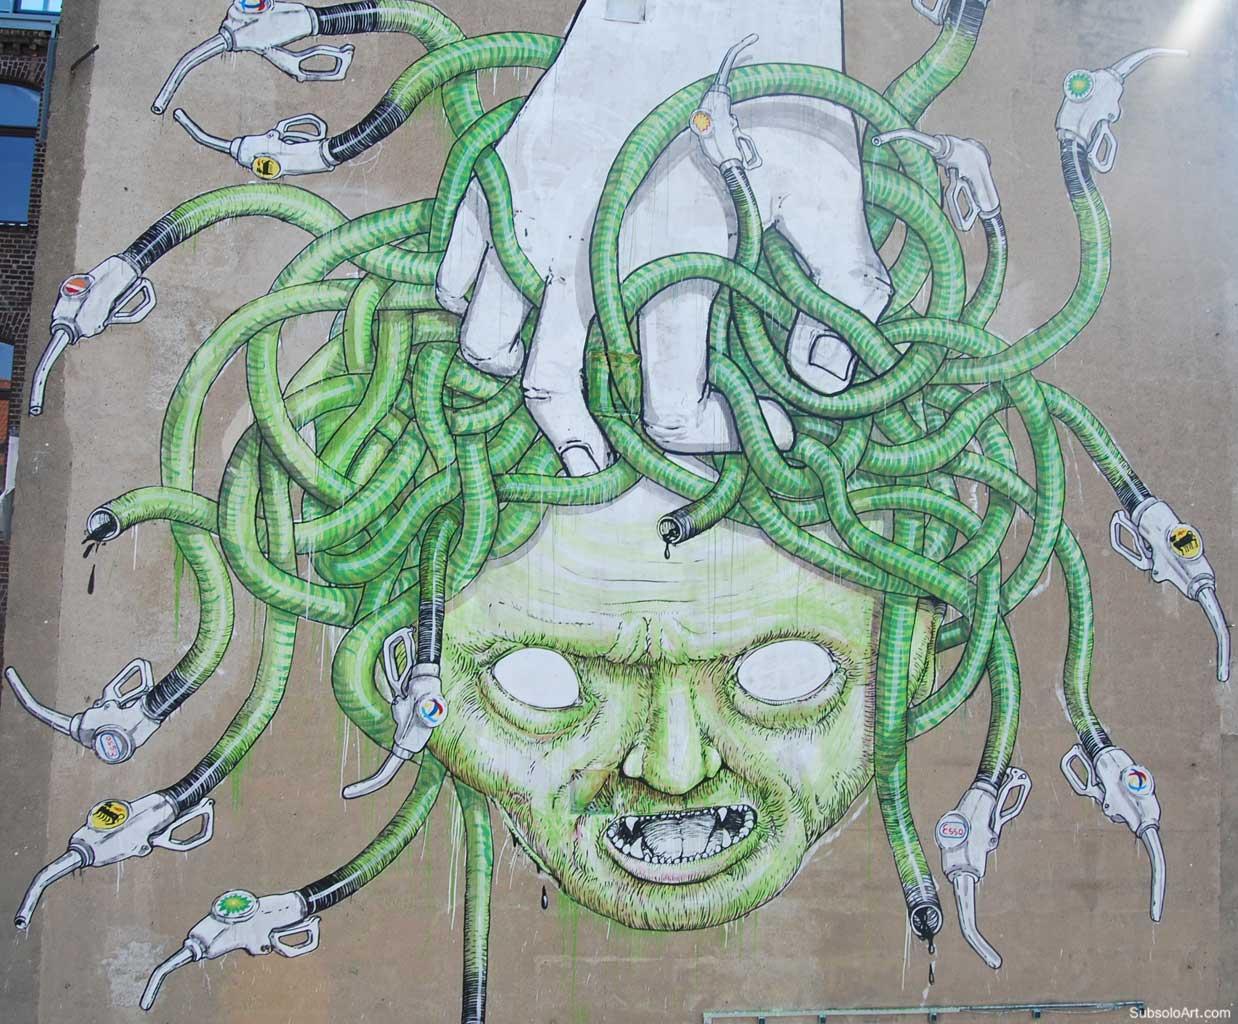 blu-grafite-italia-arte-urbana-donisio-arte (9)